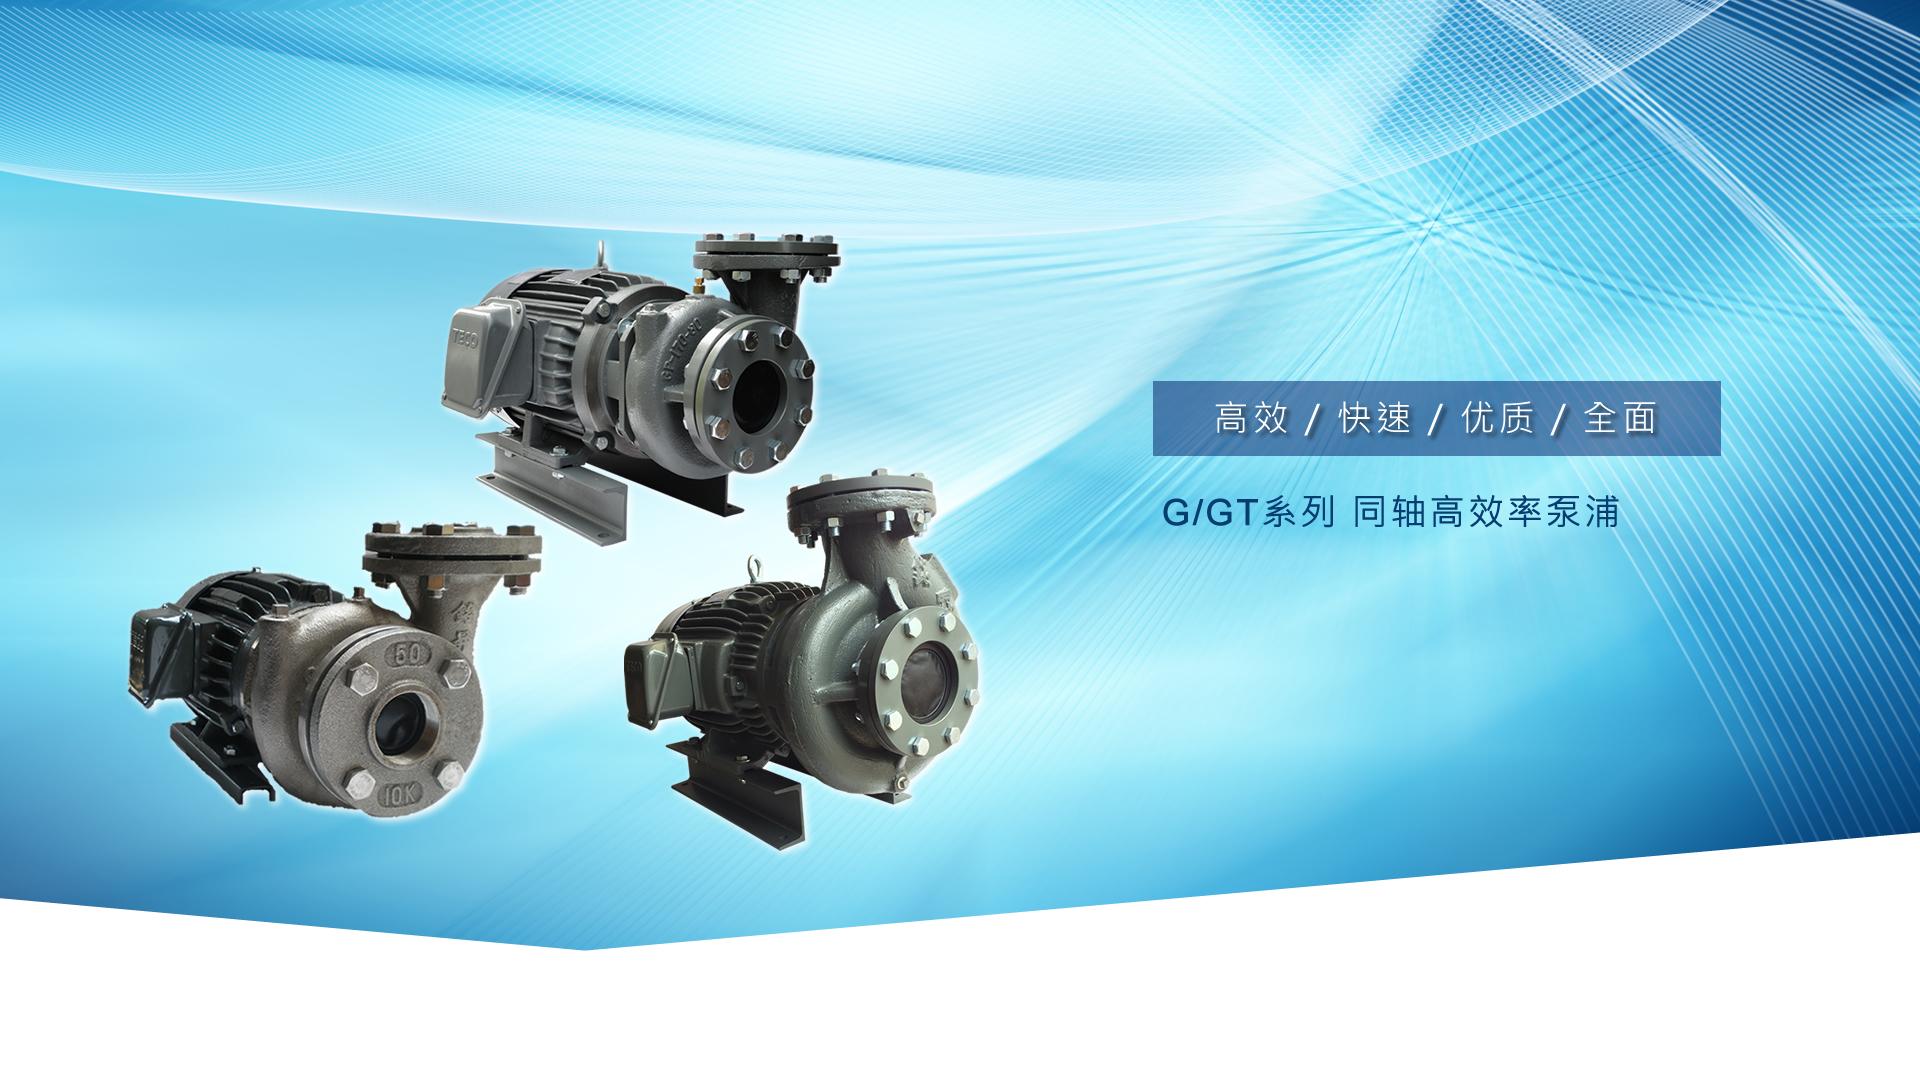 GT系列同轴高效率泵浦